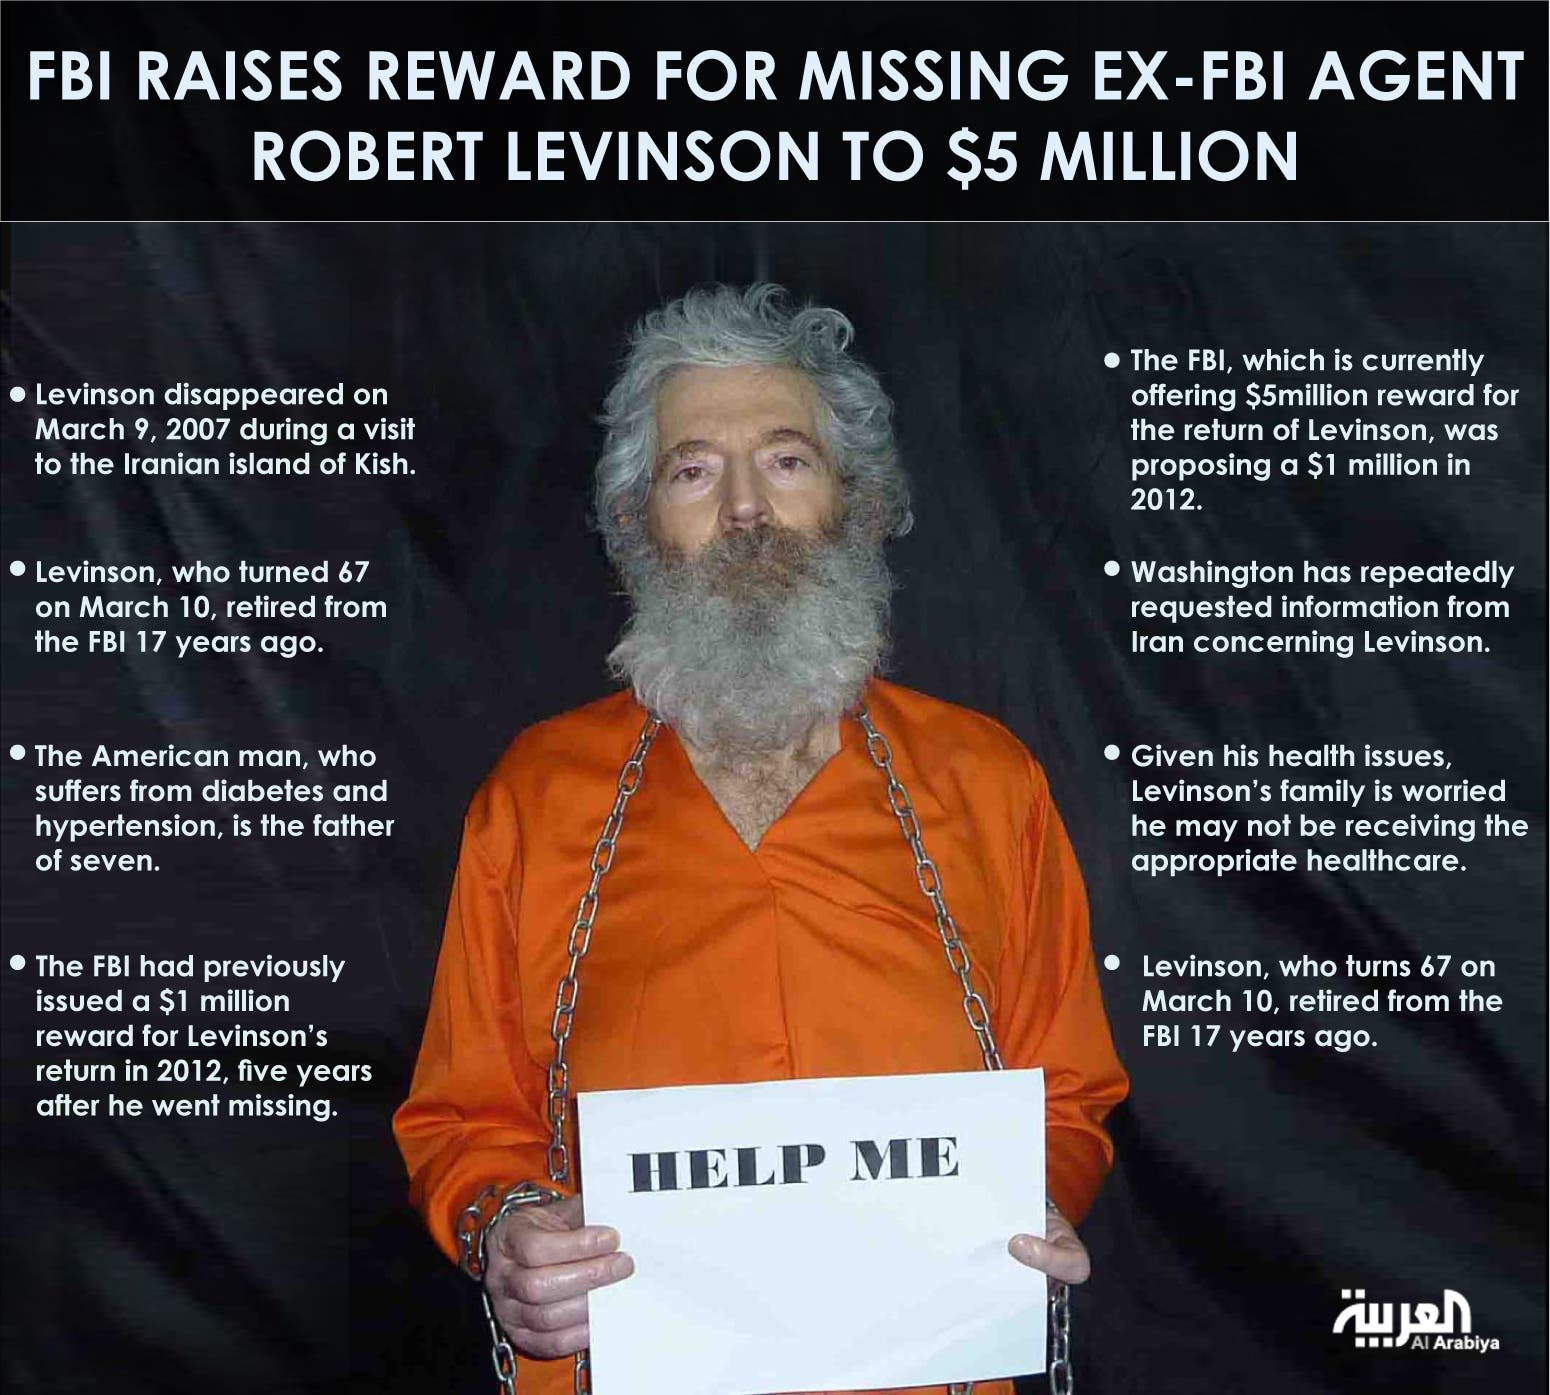 FBI raises reward for missing ex-FBI agent Robert Levinson to $5 million infographic